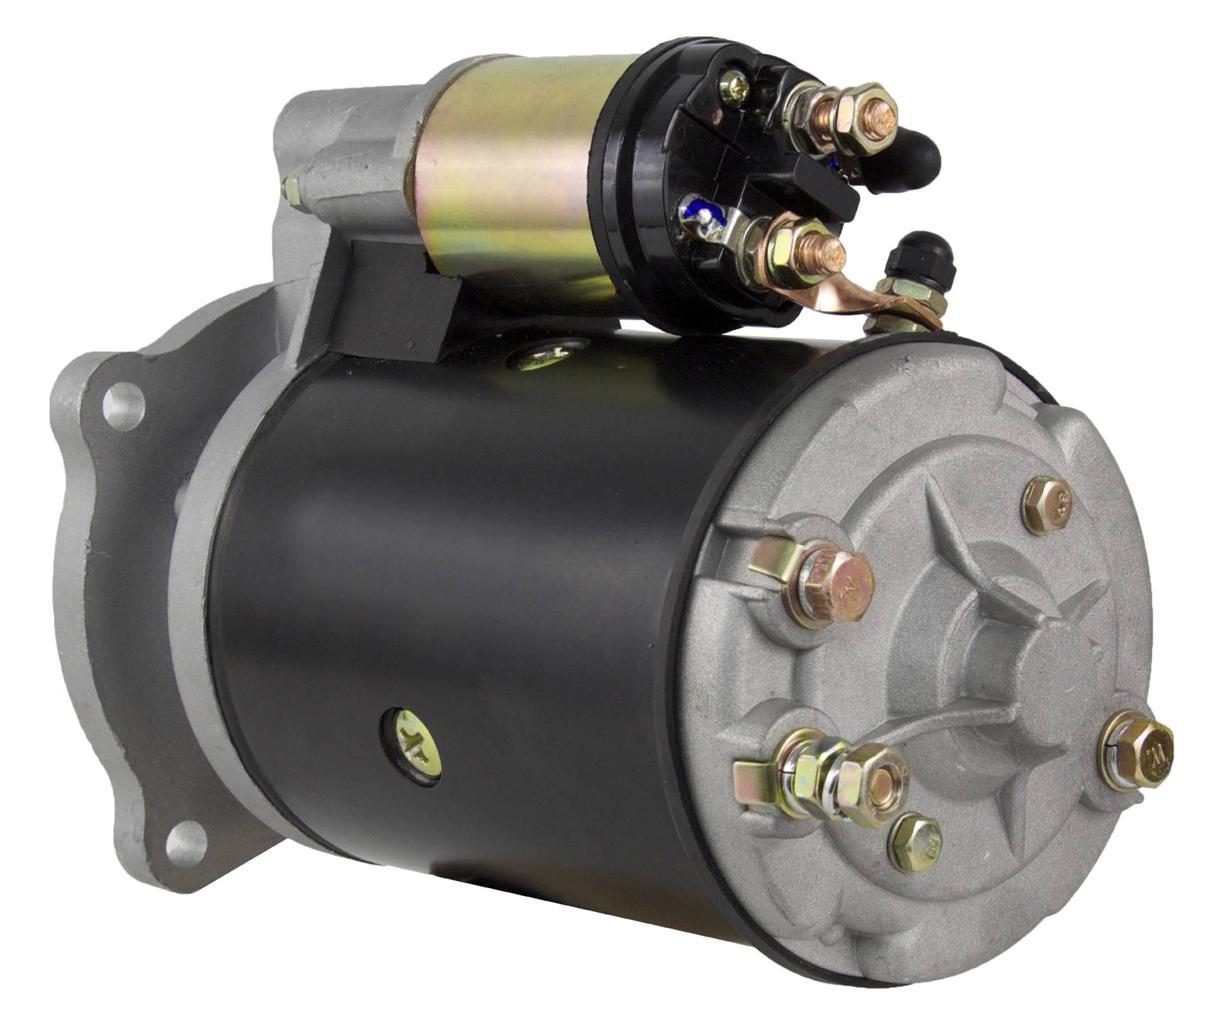 Deal Dash Com Tvs >> NEW STARTER MOTOR FITS NEW HOLLAND WINDROWER 1112 1114 907 909 66925170S - Tanga